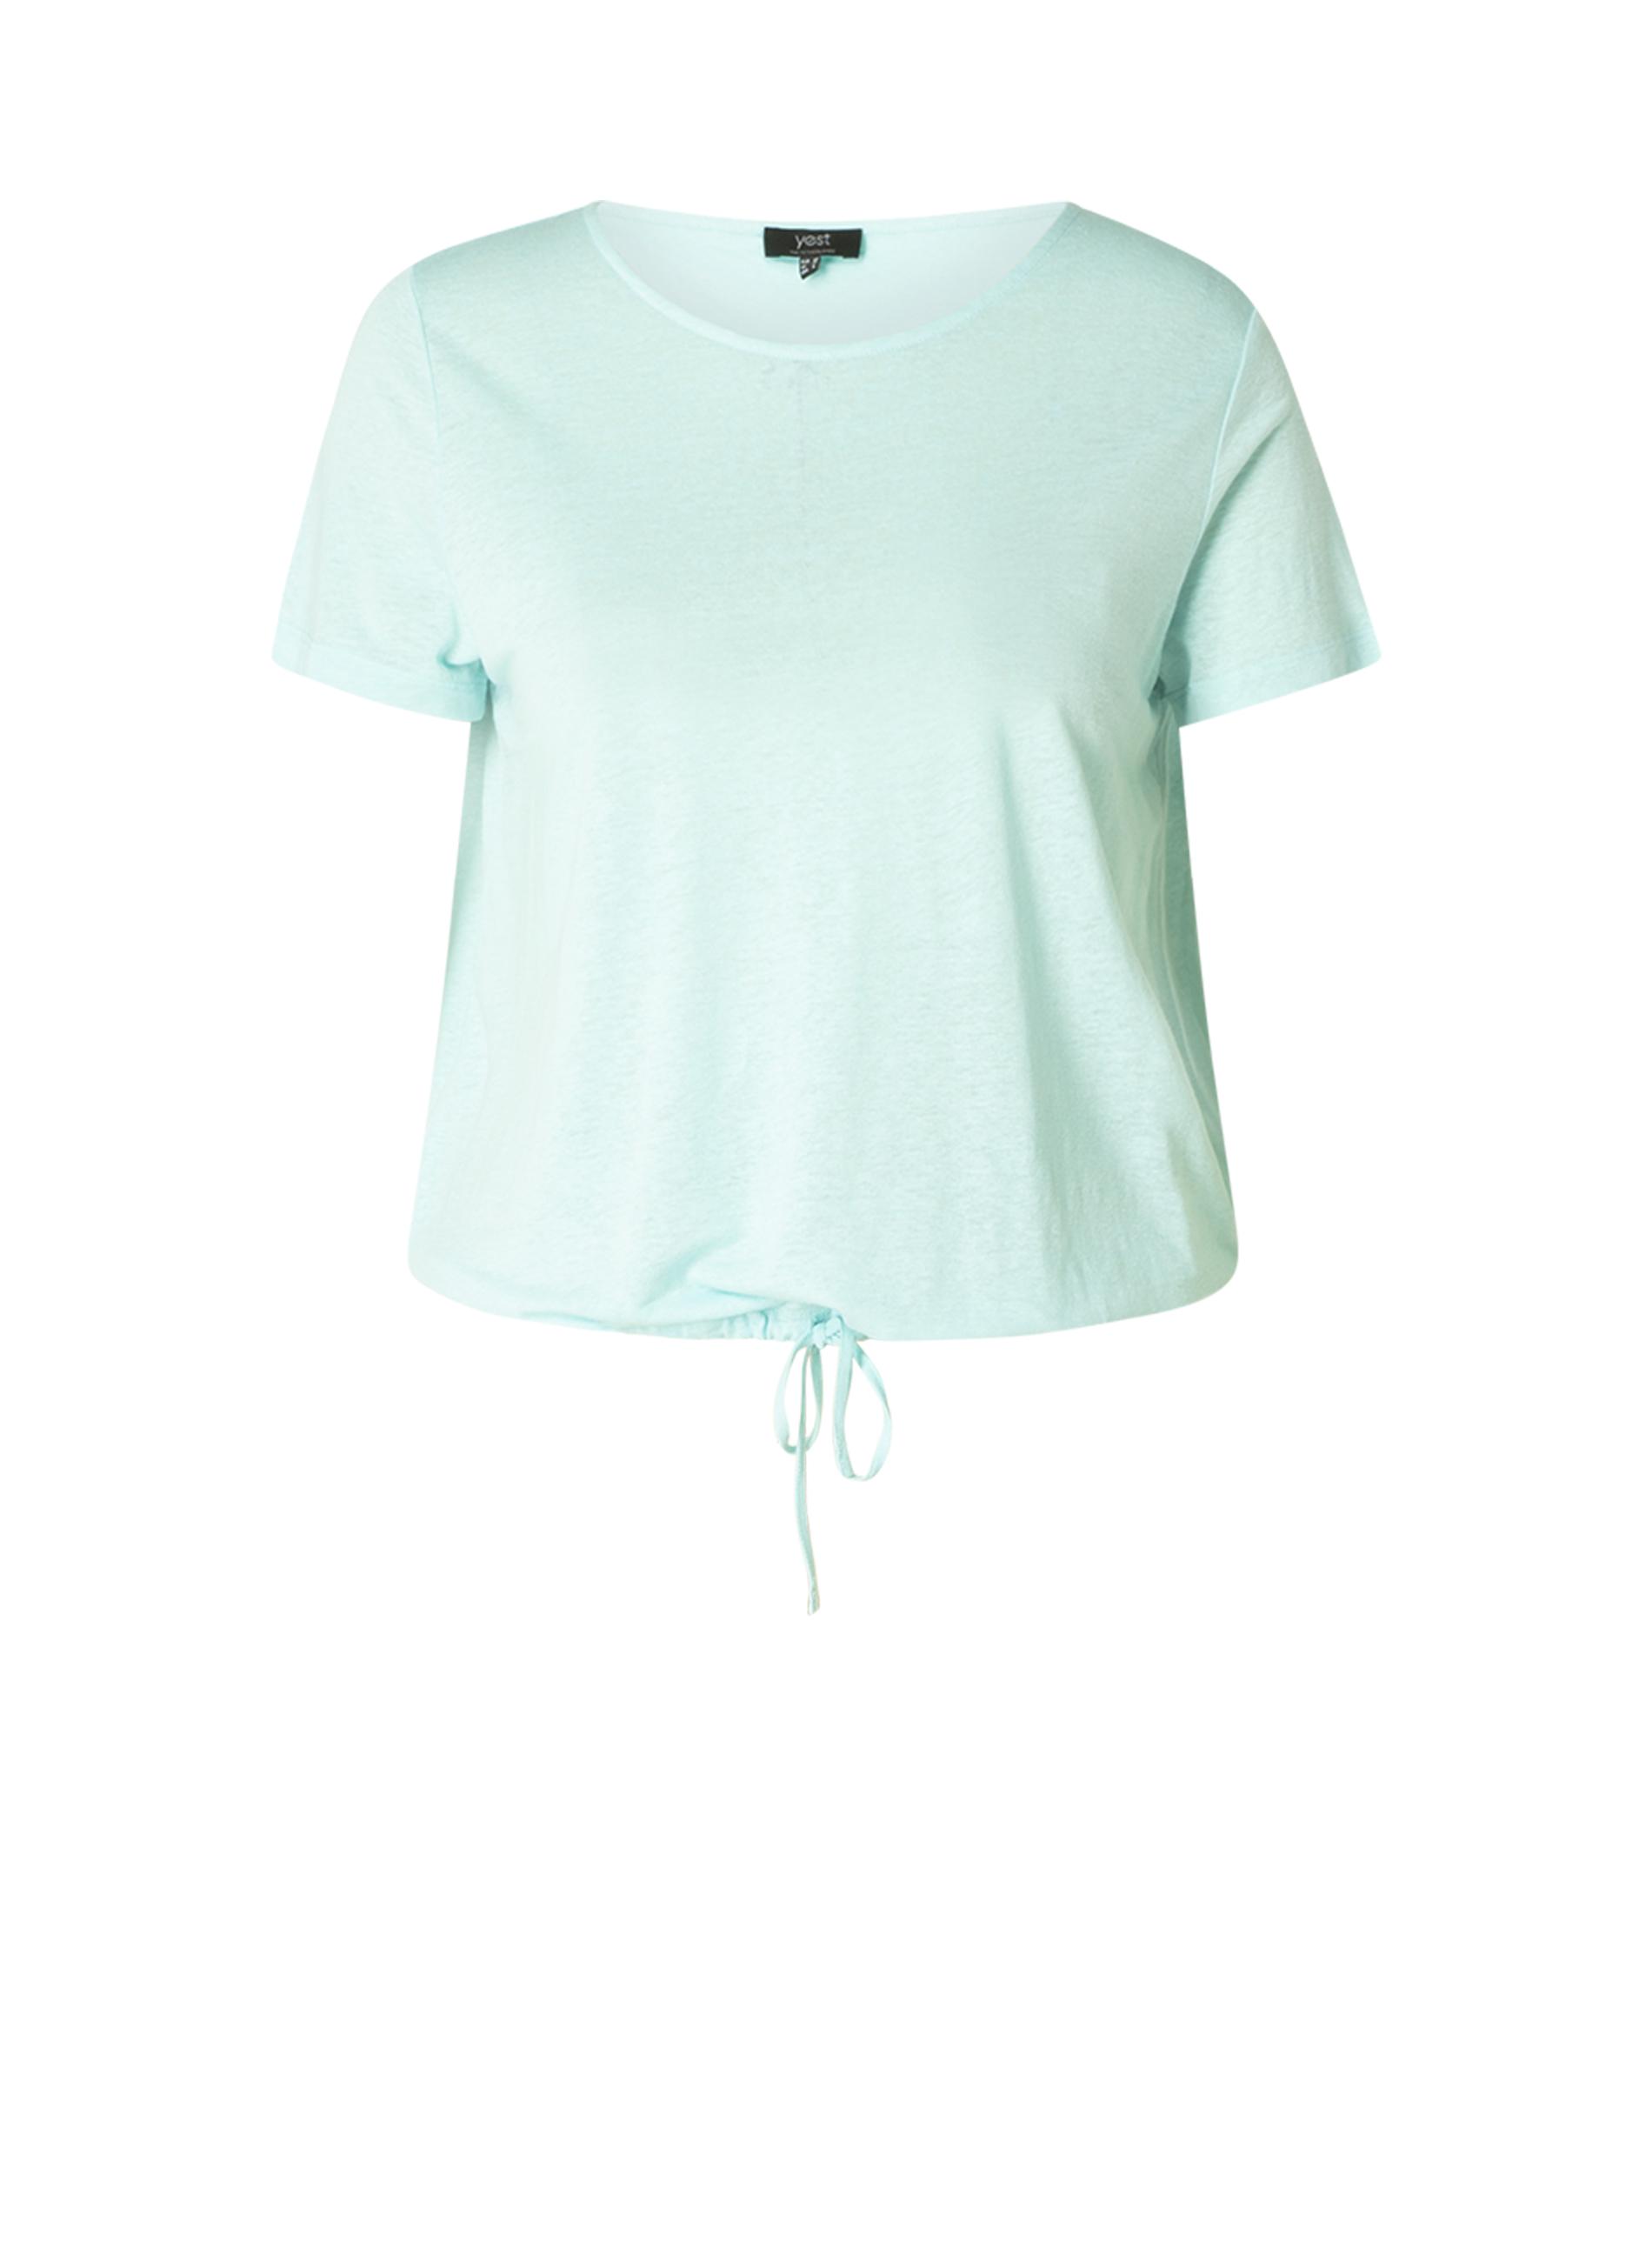 Yest shirt Kody 60 cm